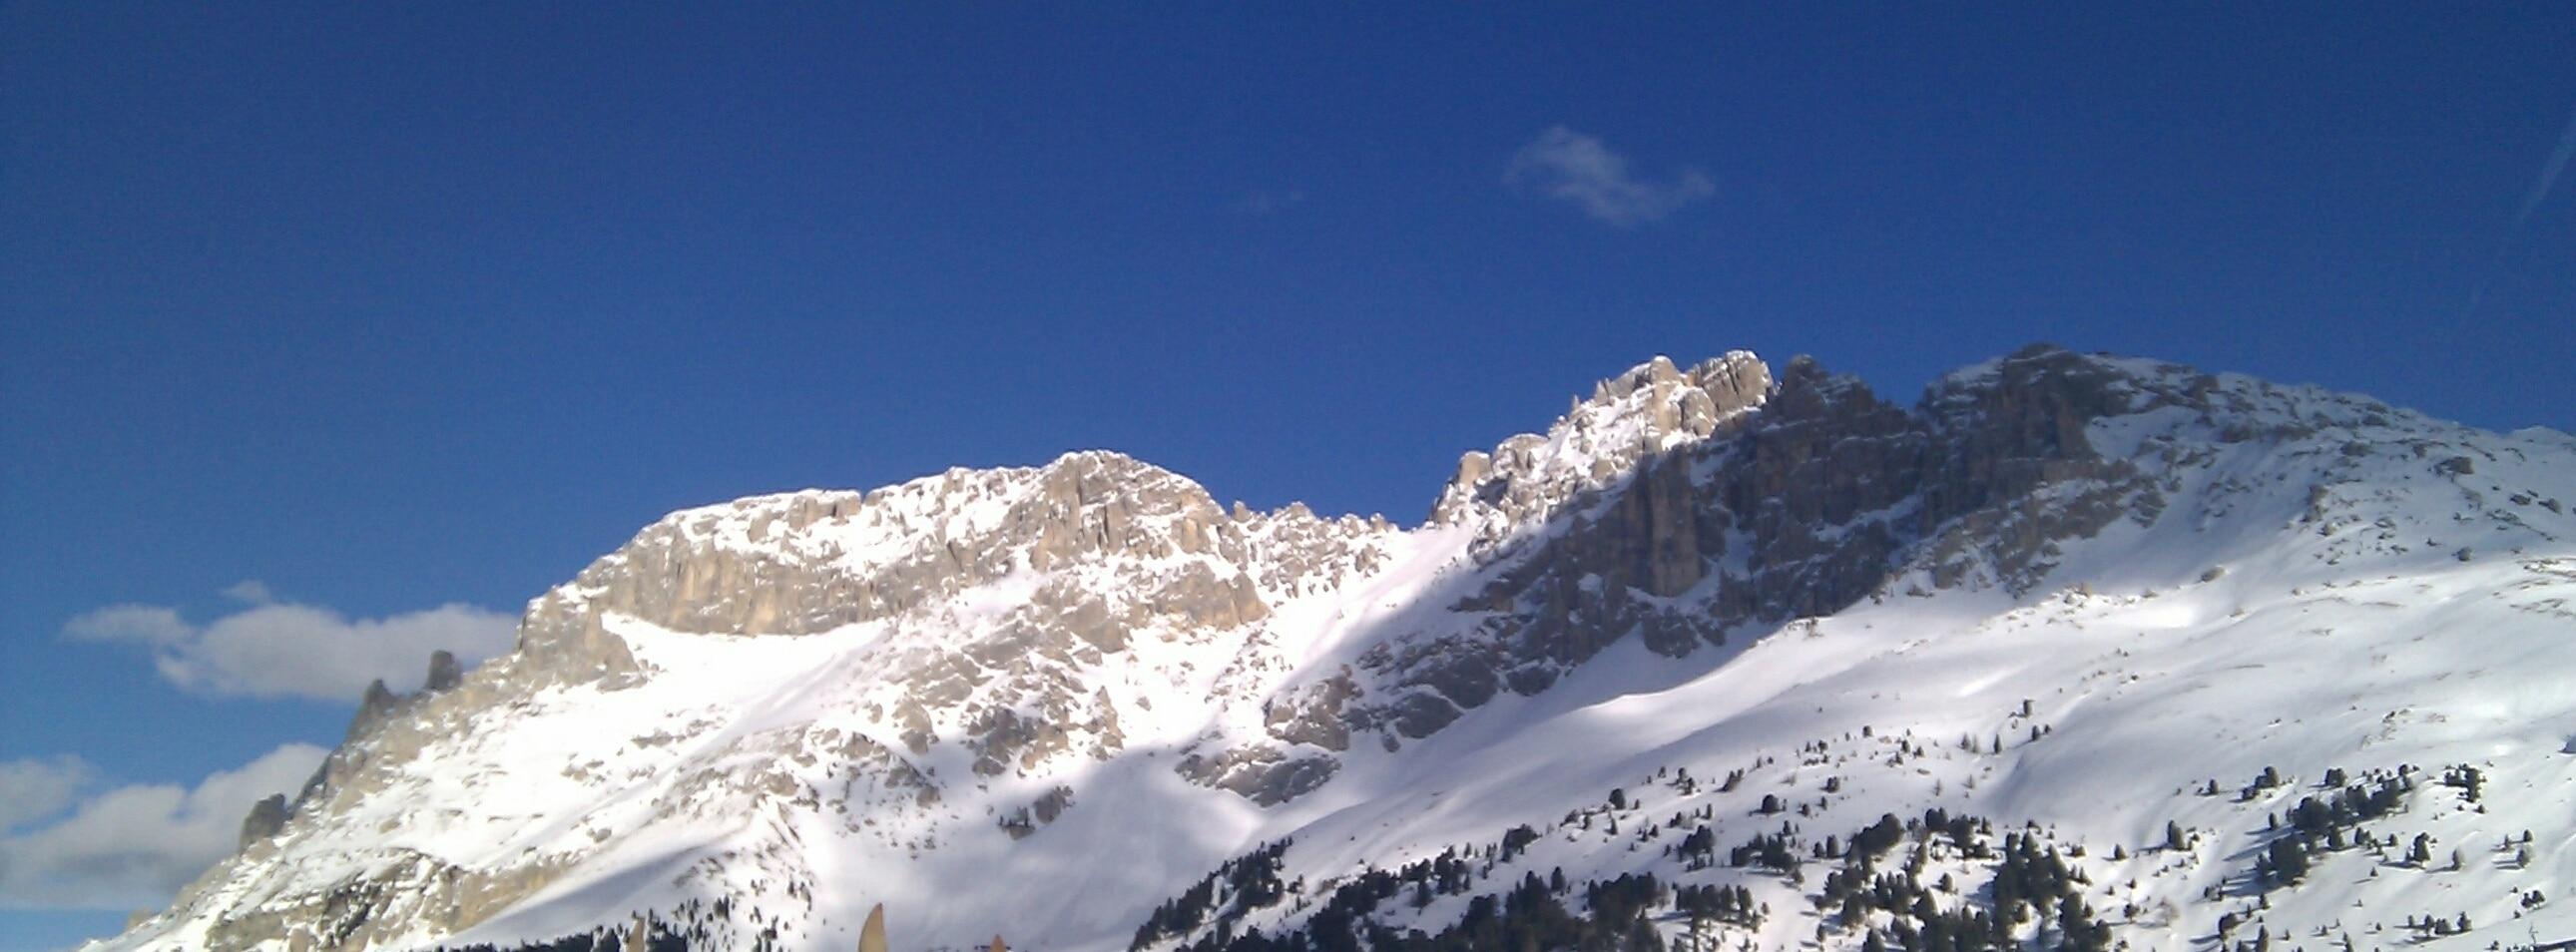 Deutschnofen, Trentino-Südtirol, Italien